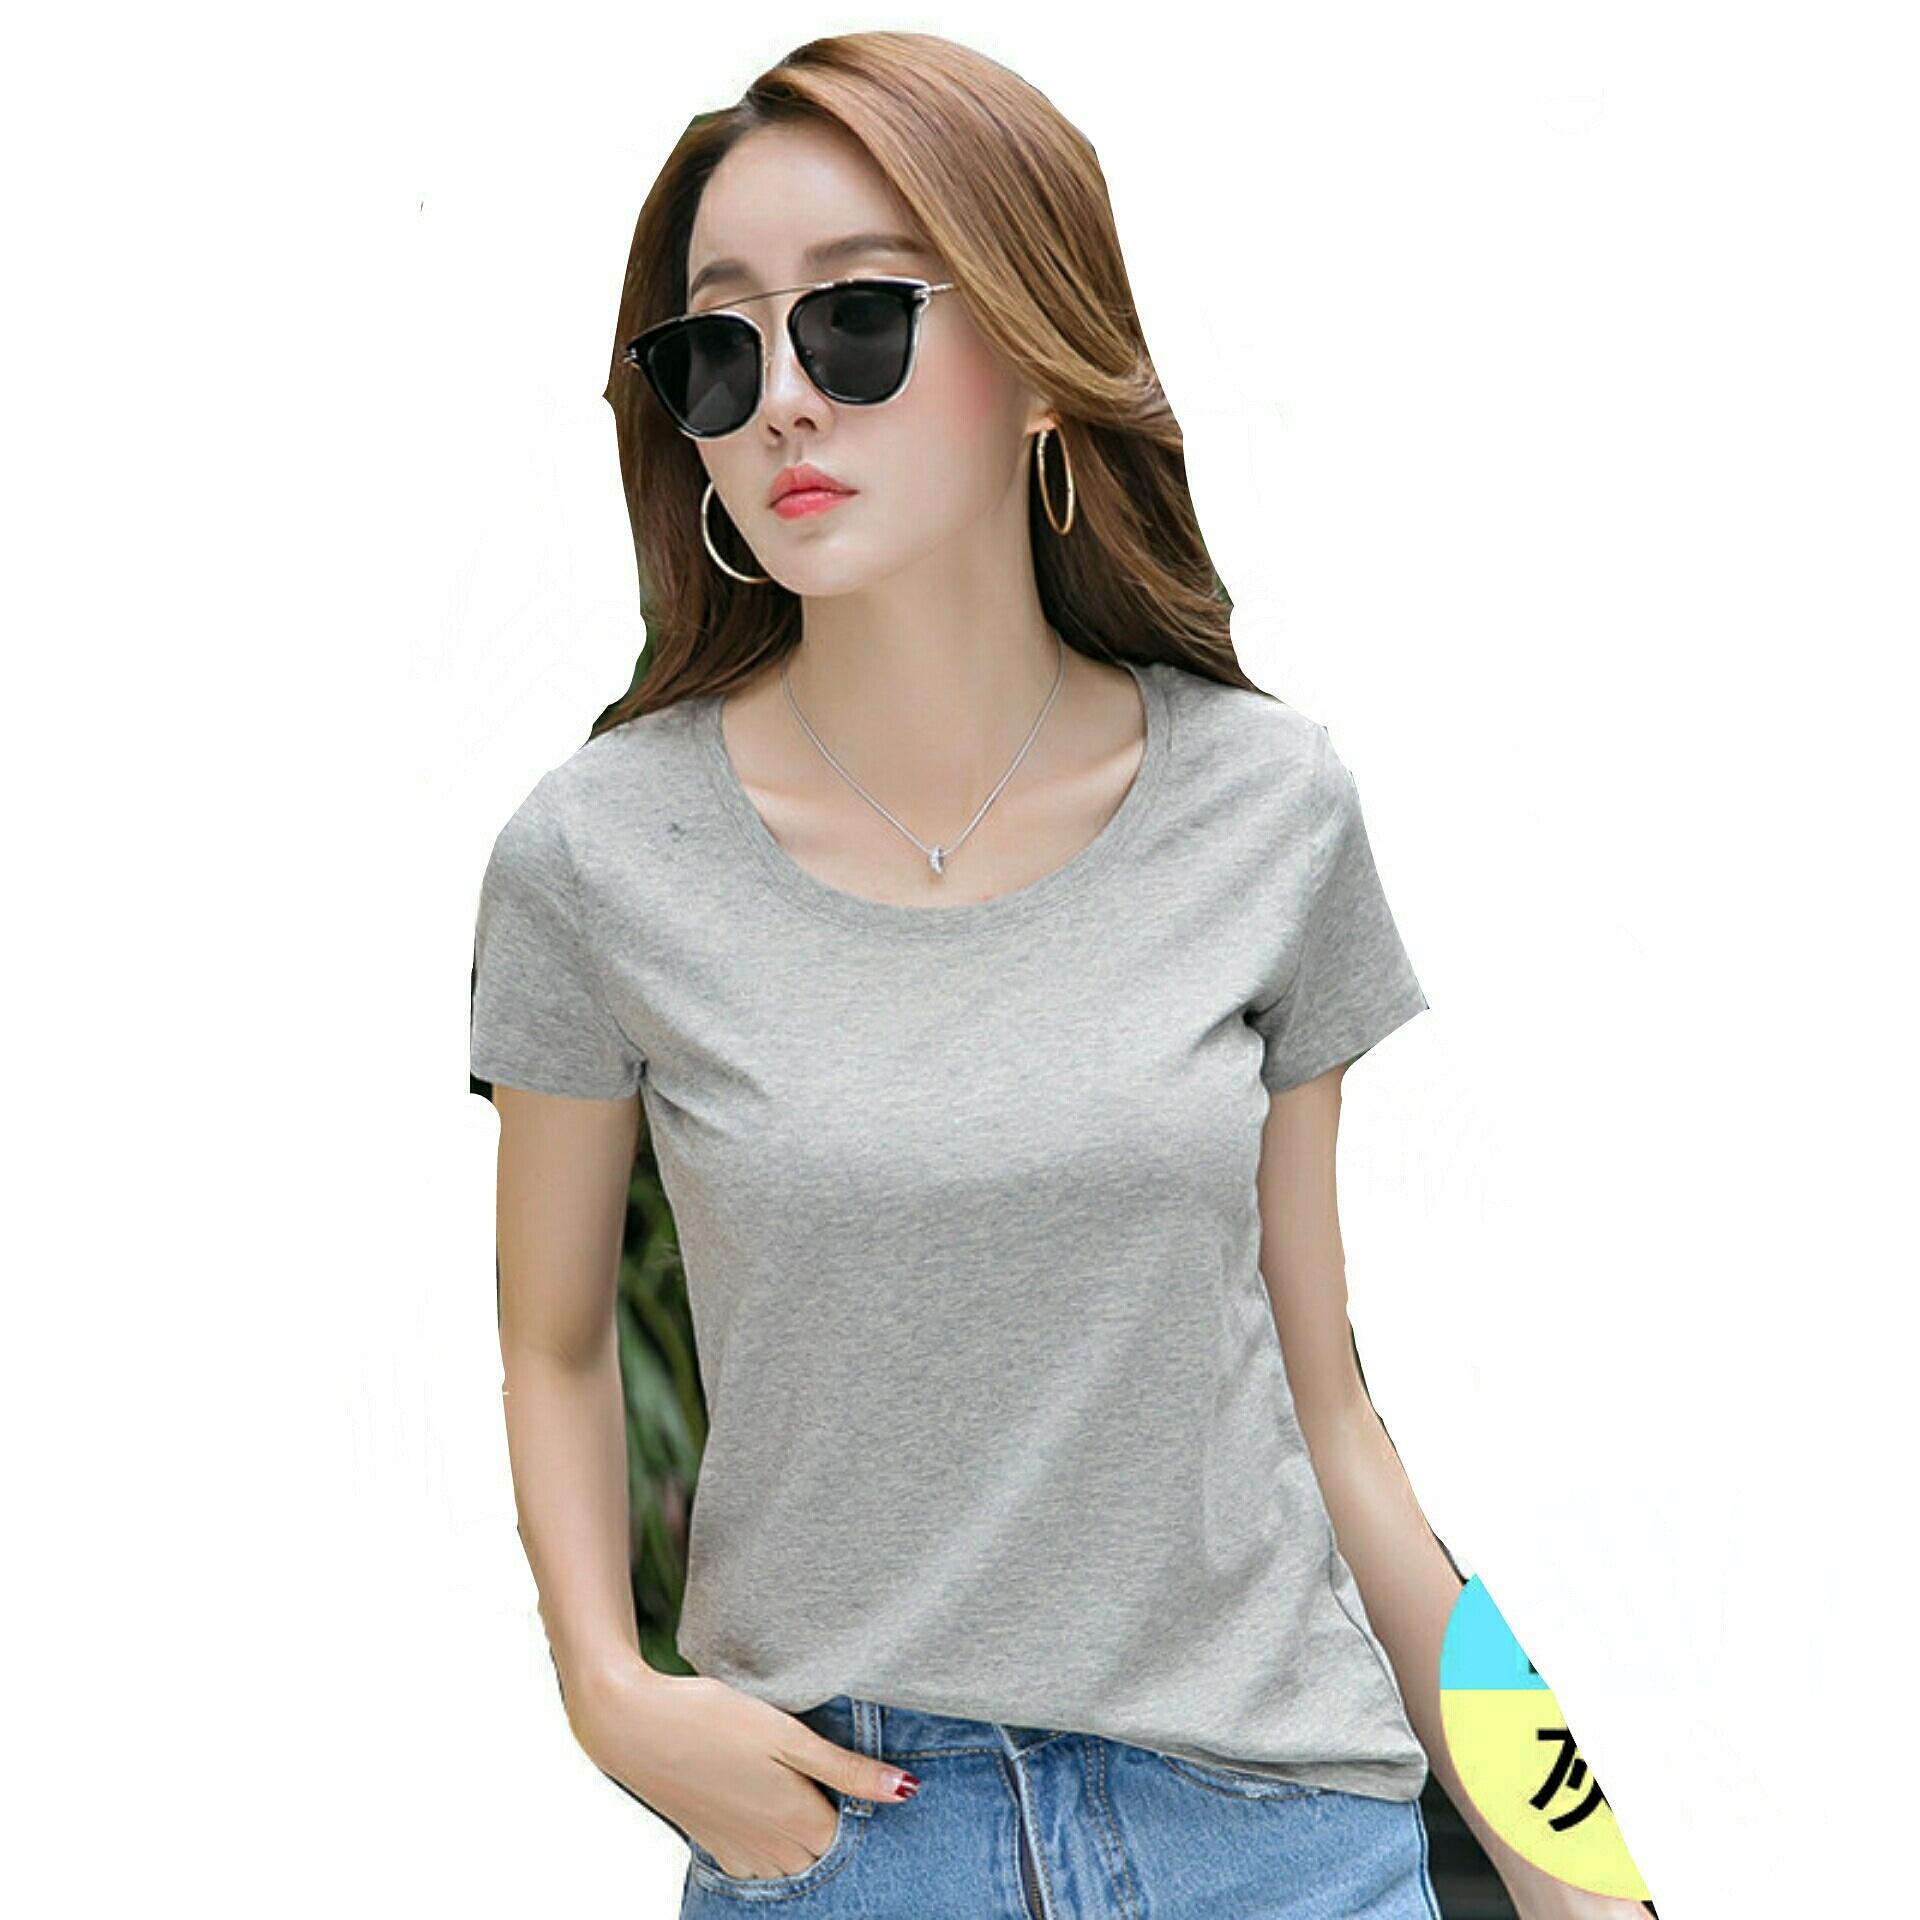 Bratajaya Kaos Wanita T-shirt O neck polos / Kaos Polos / Kaos Wanita